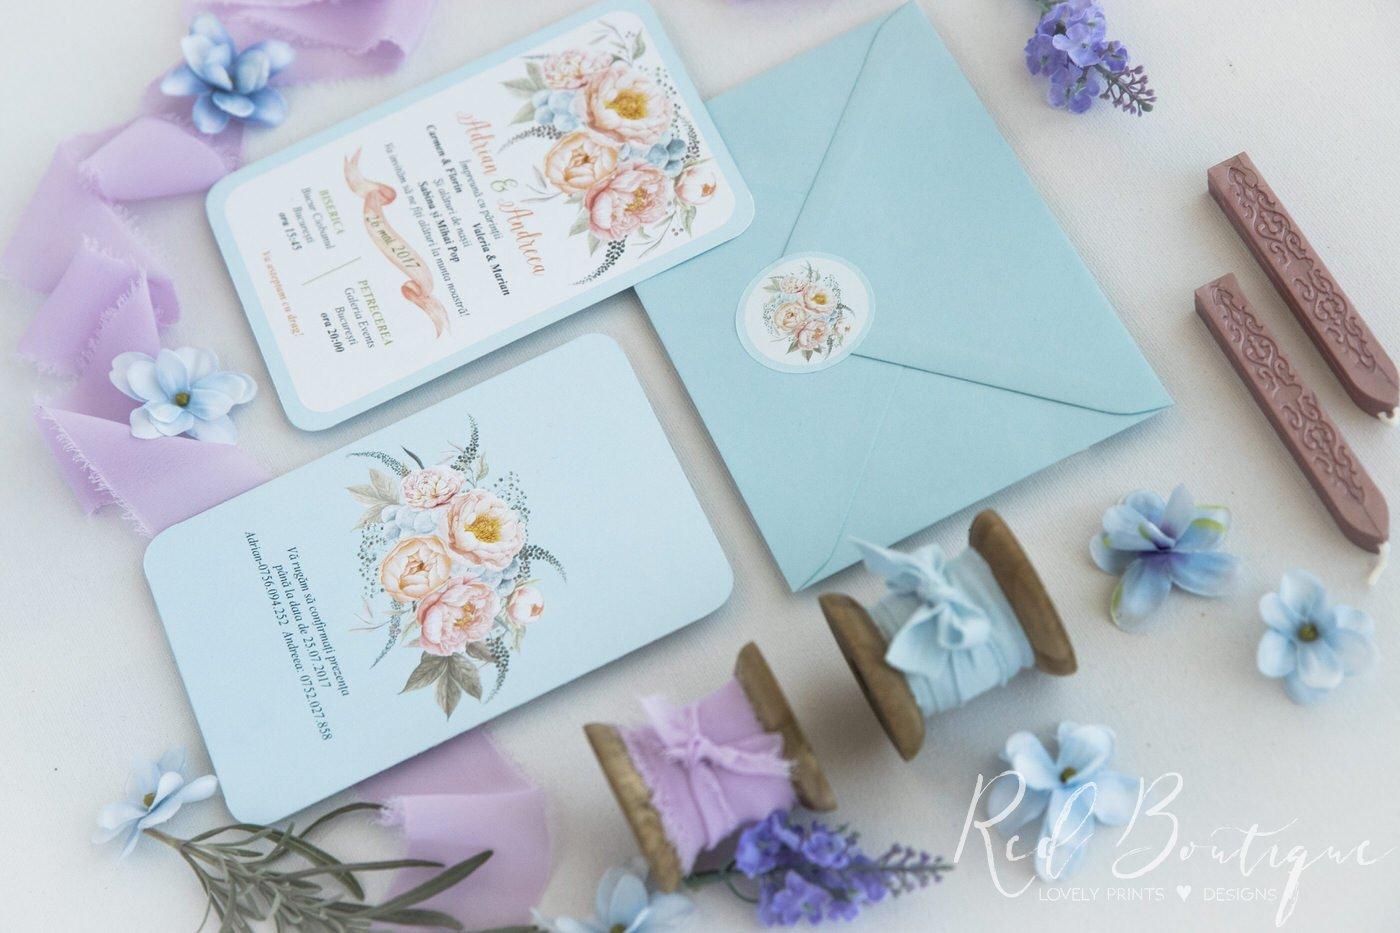 invitatie de nunta postcard in detaliu cu albastru deschis si bujori